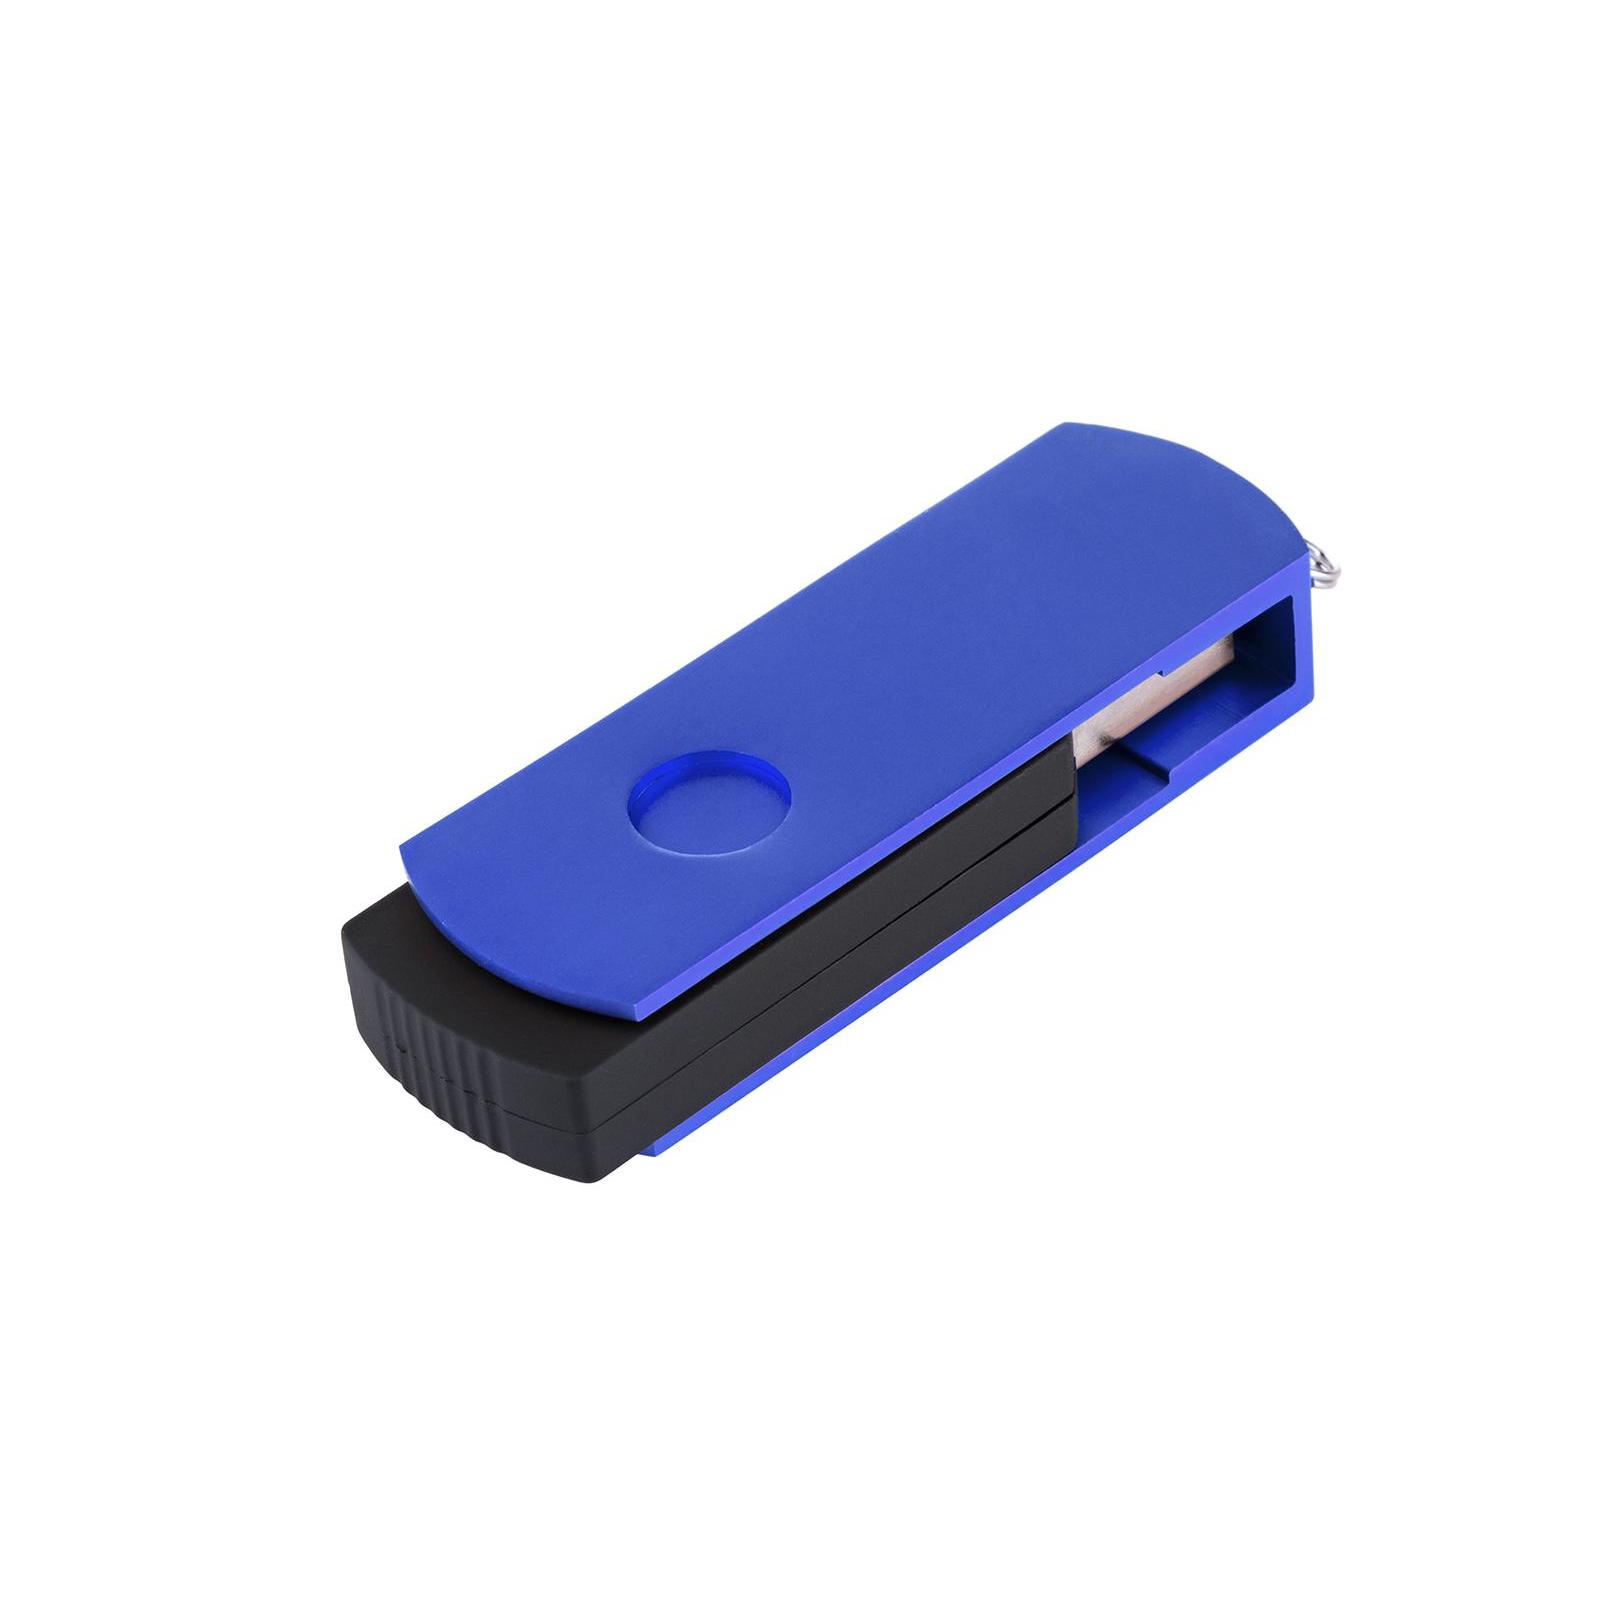 USB флеш накопитель eXceleram 16GB P2 Series Blue/Black USB 3.1 Gen 1 (EXP2U3BLB16) изображение 6